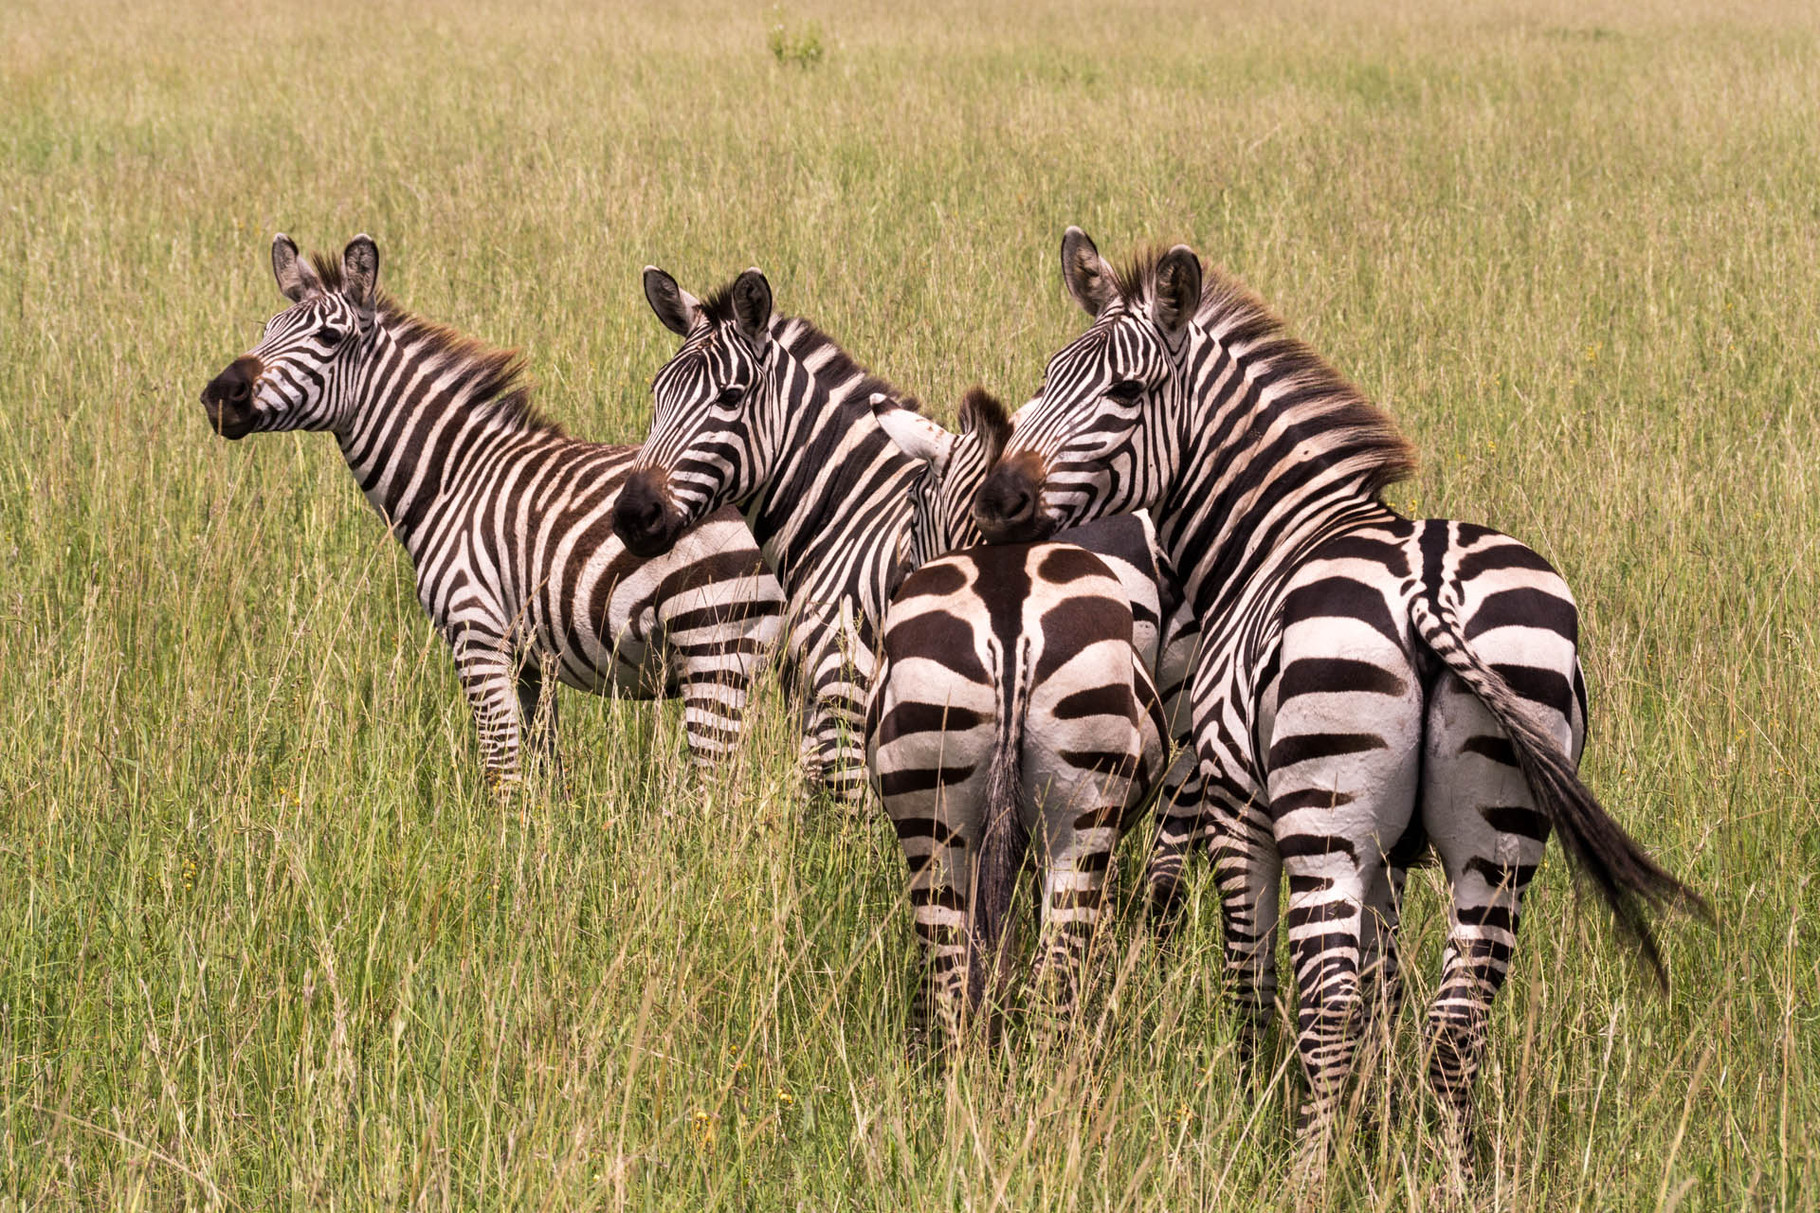 Zebras [Serengeti, Tanzania, 2015]